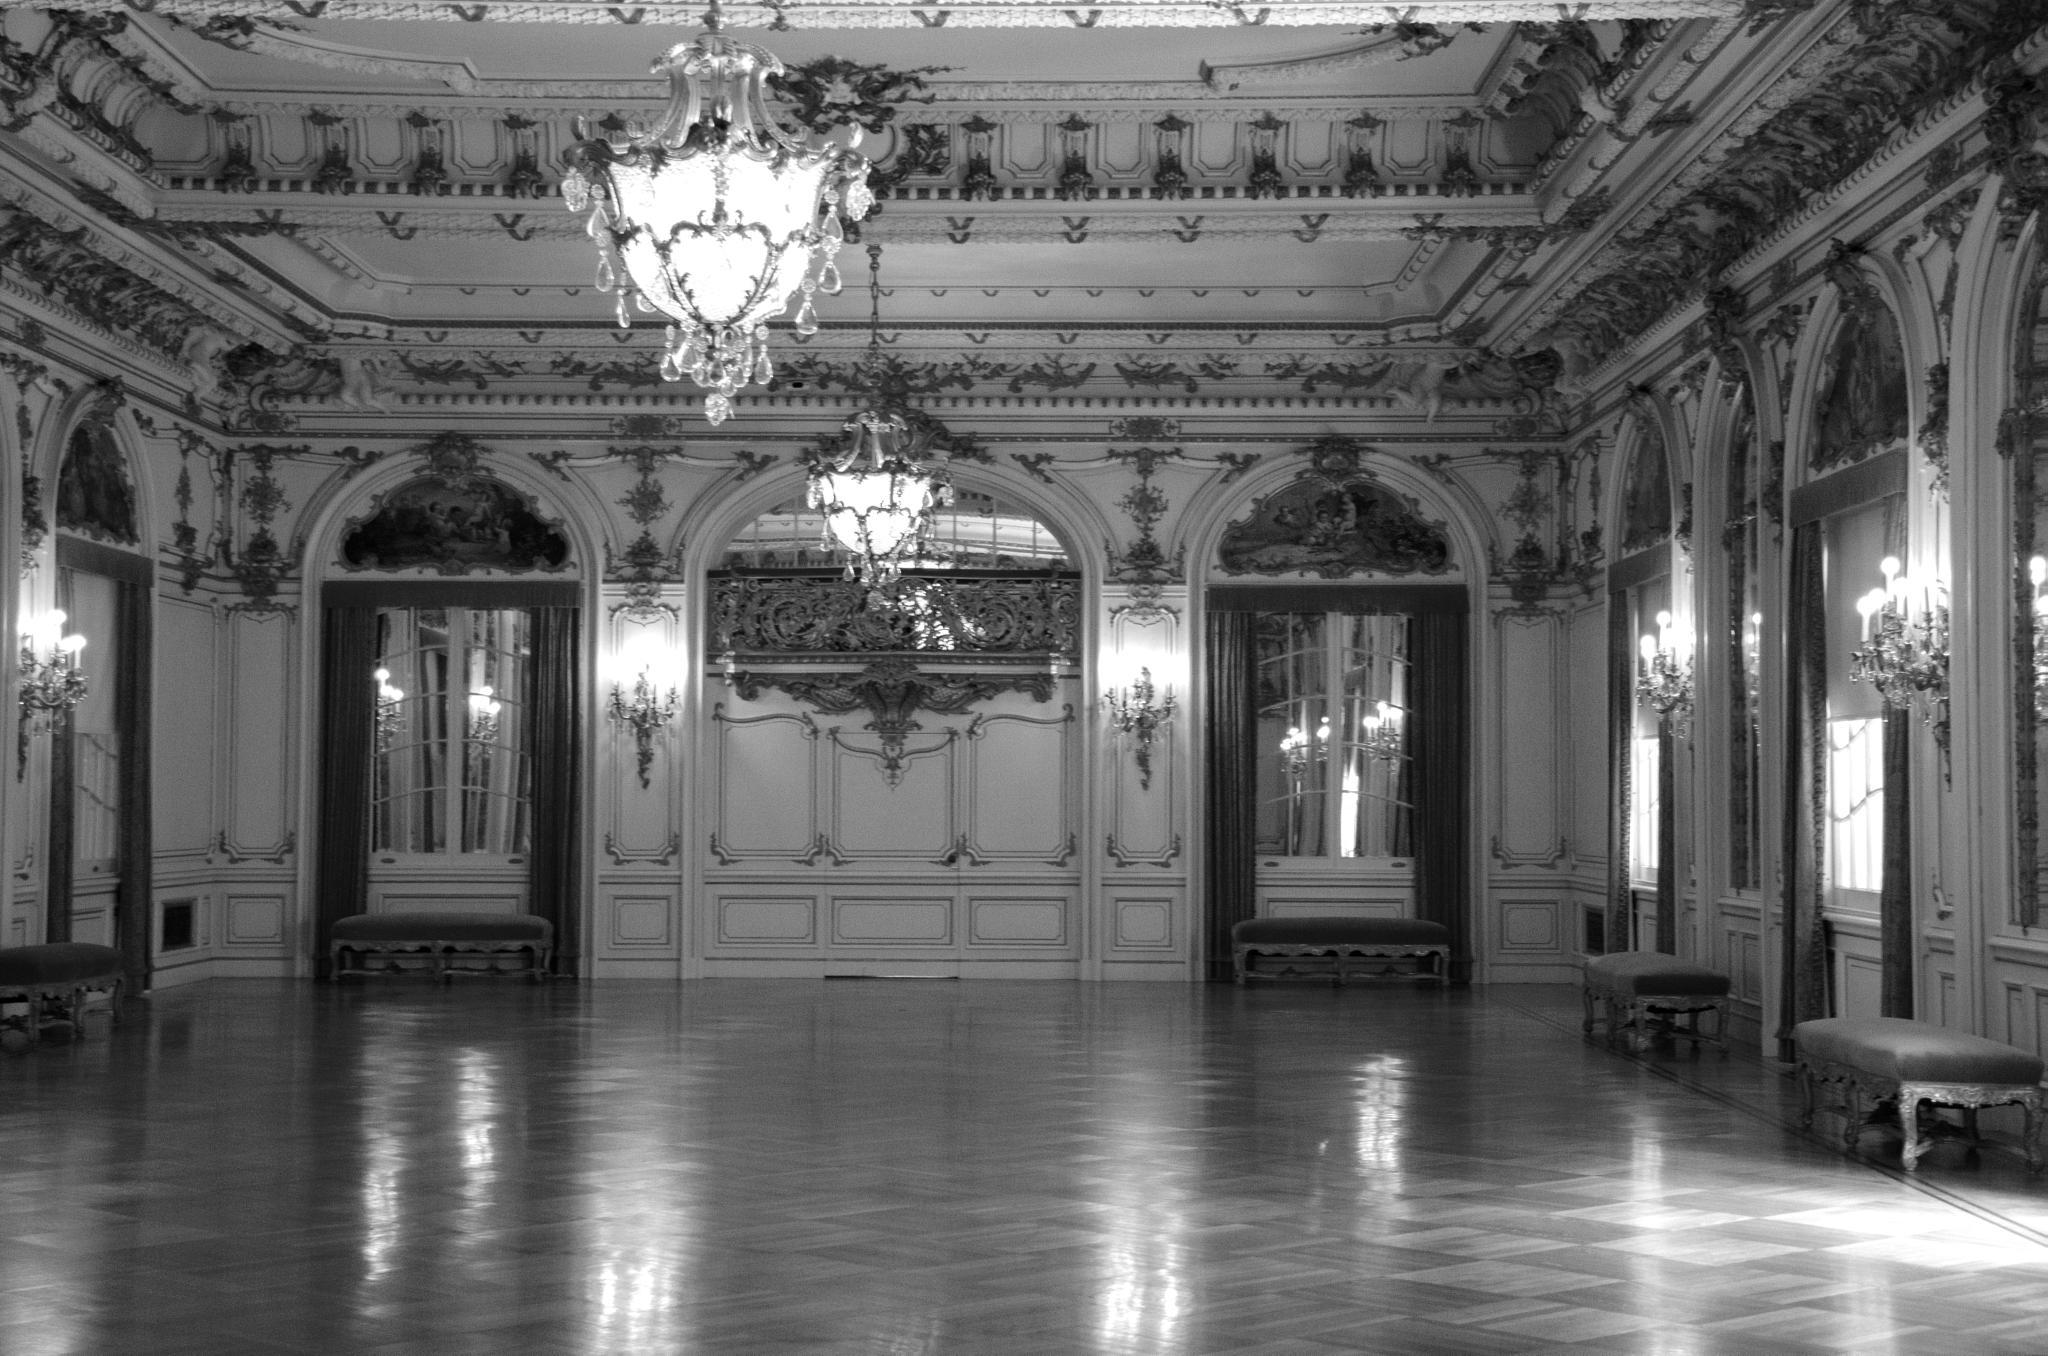 Grand Ballroom by Laurence (Sam) Warriner